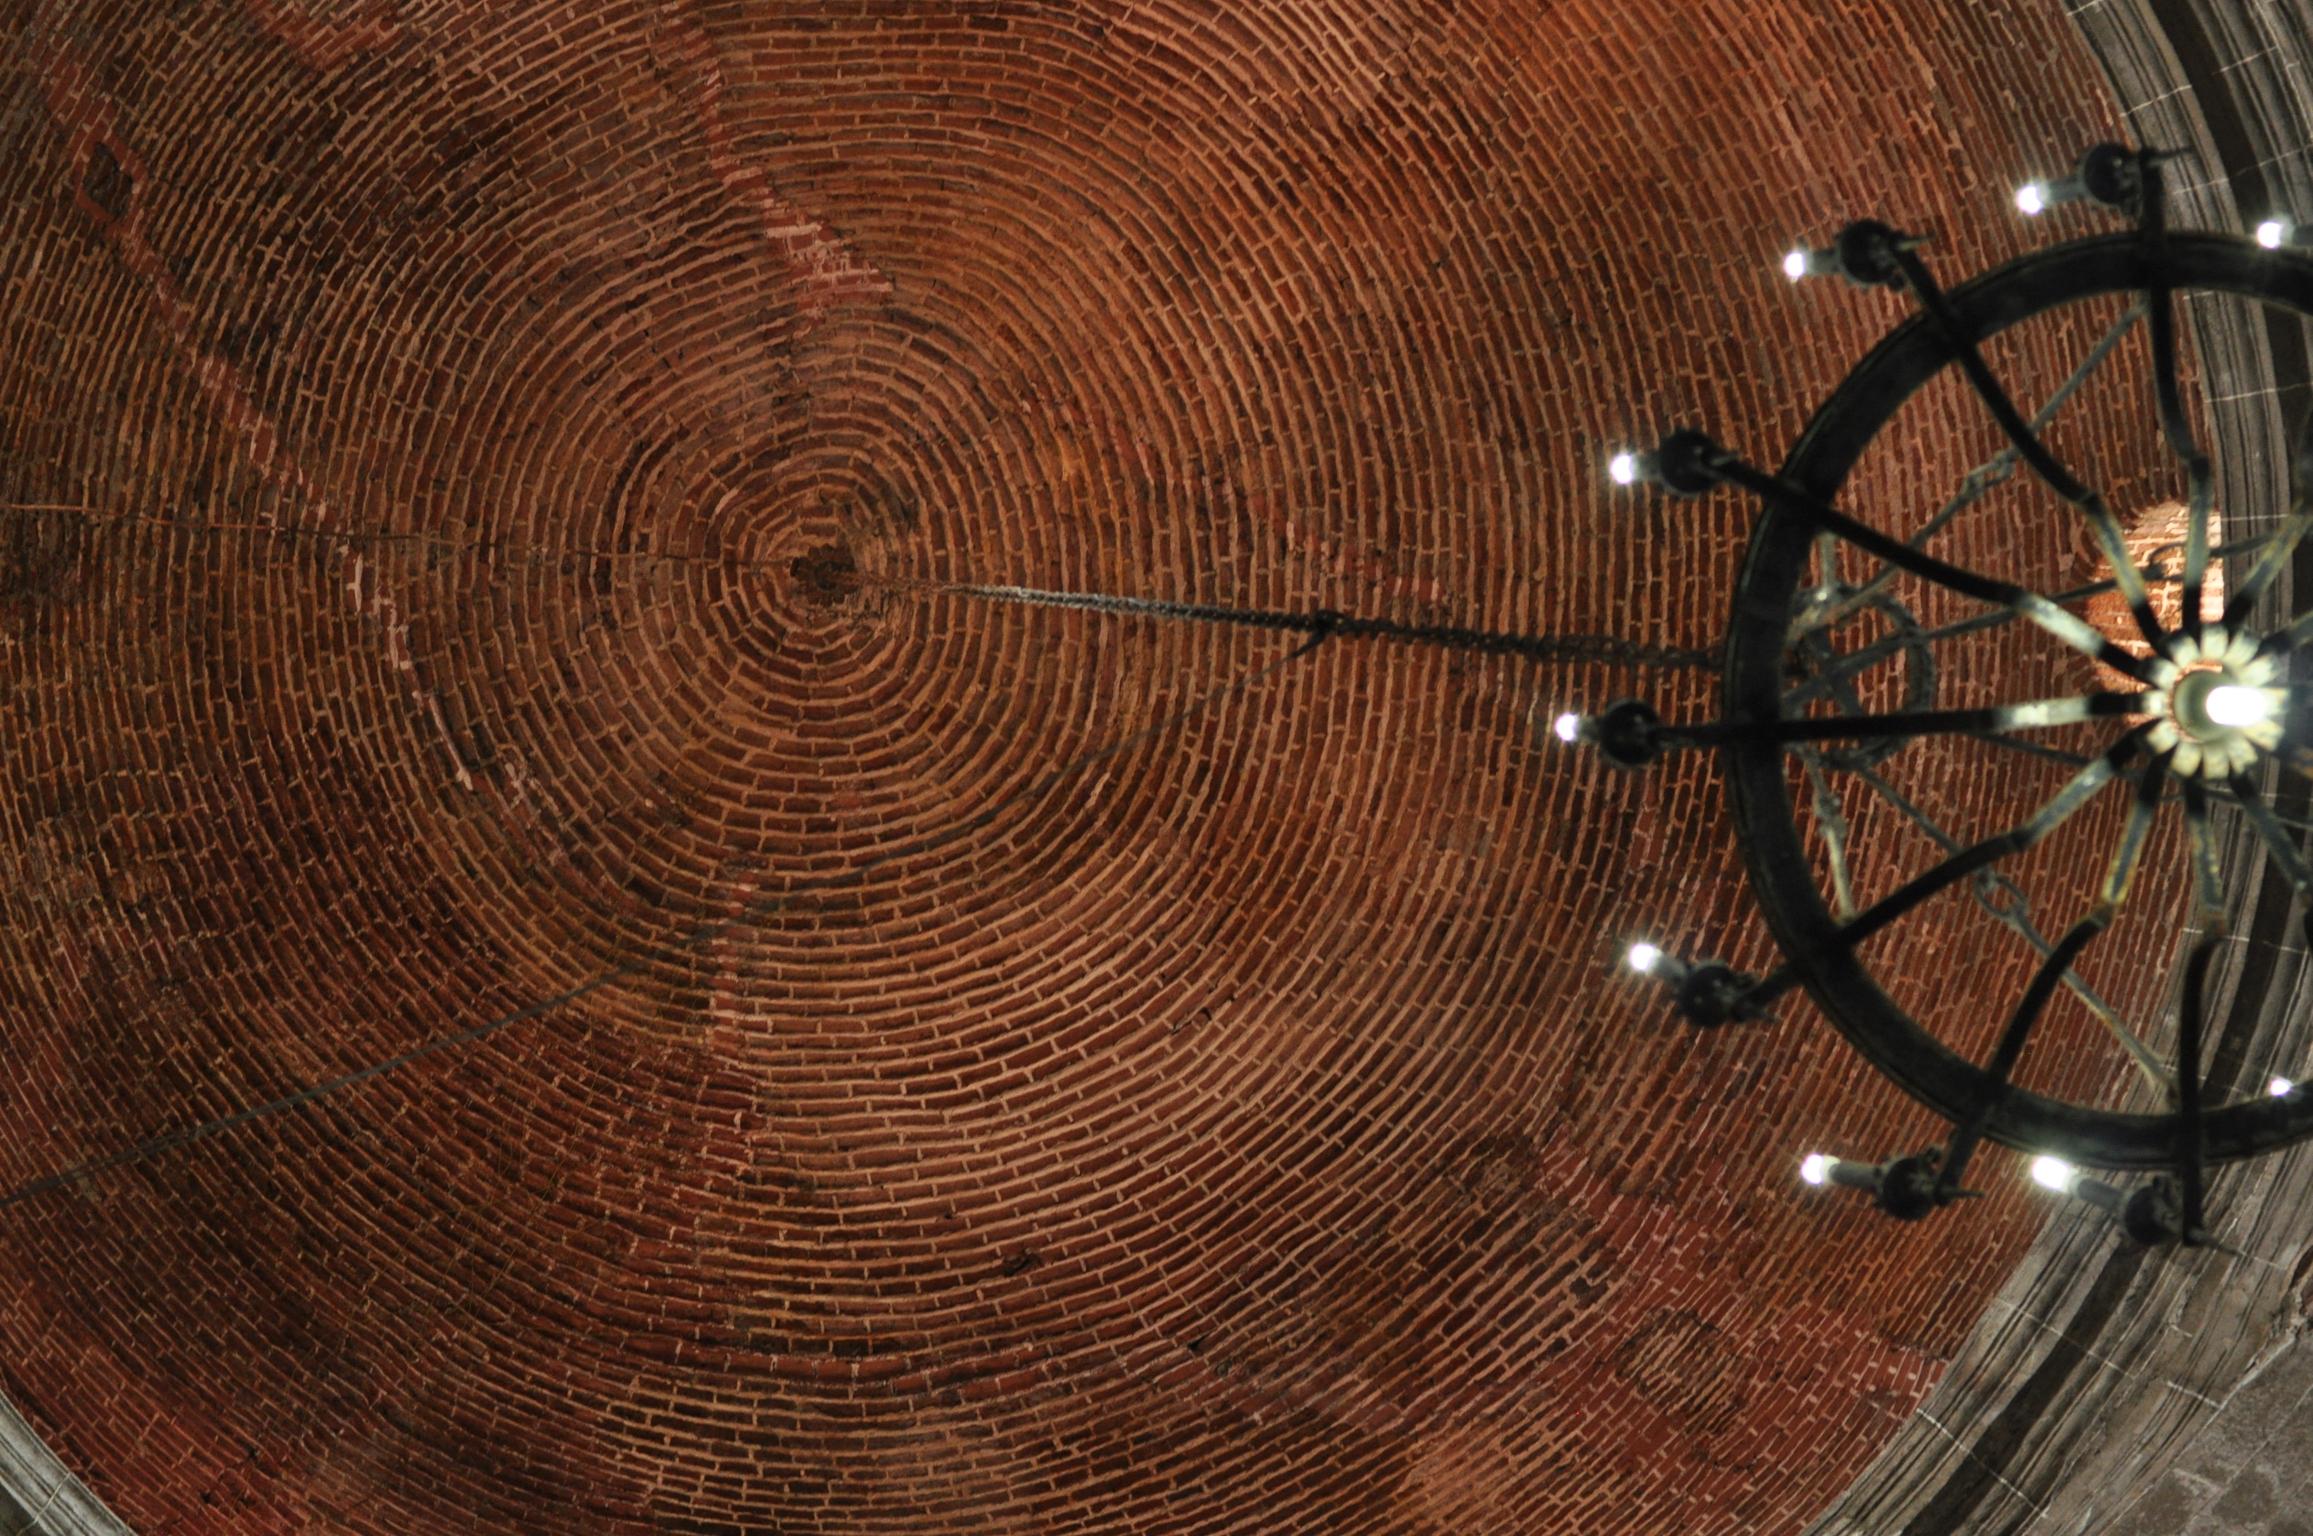 Spiral bricks and candelabra in dome of San Agustin Church, Intramuros, Manila Philippines